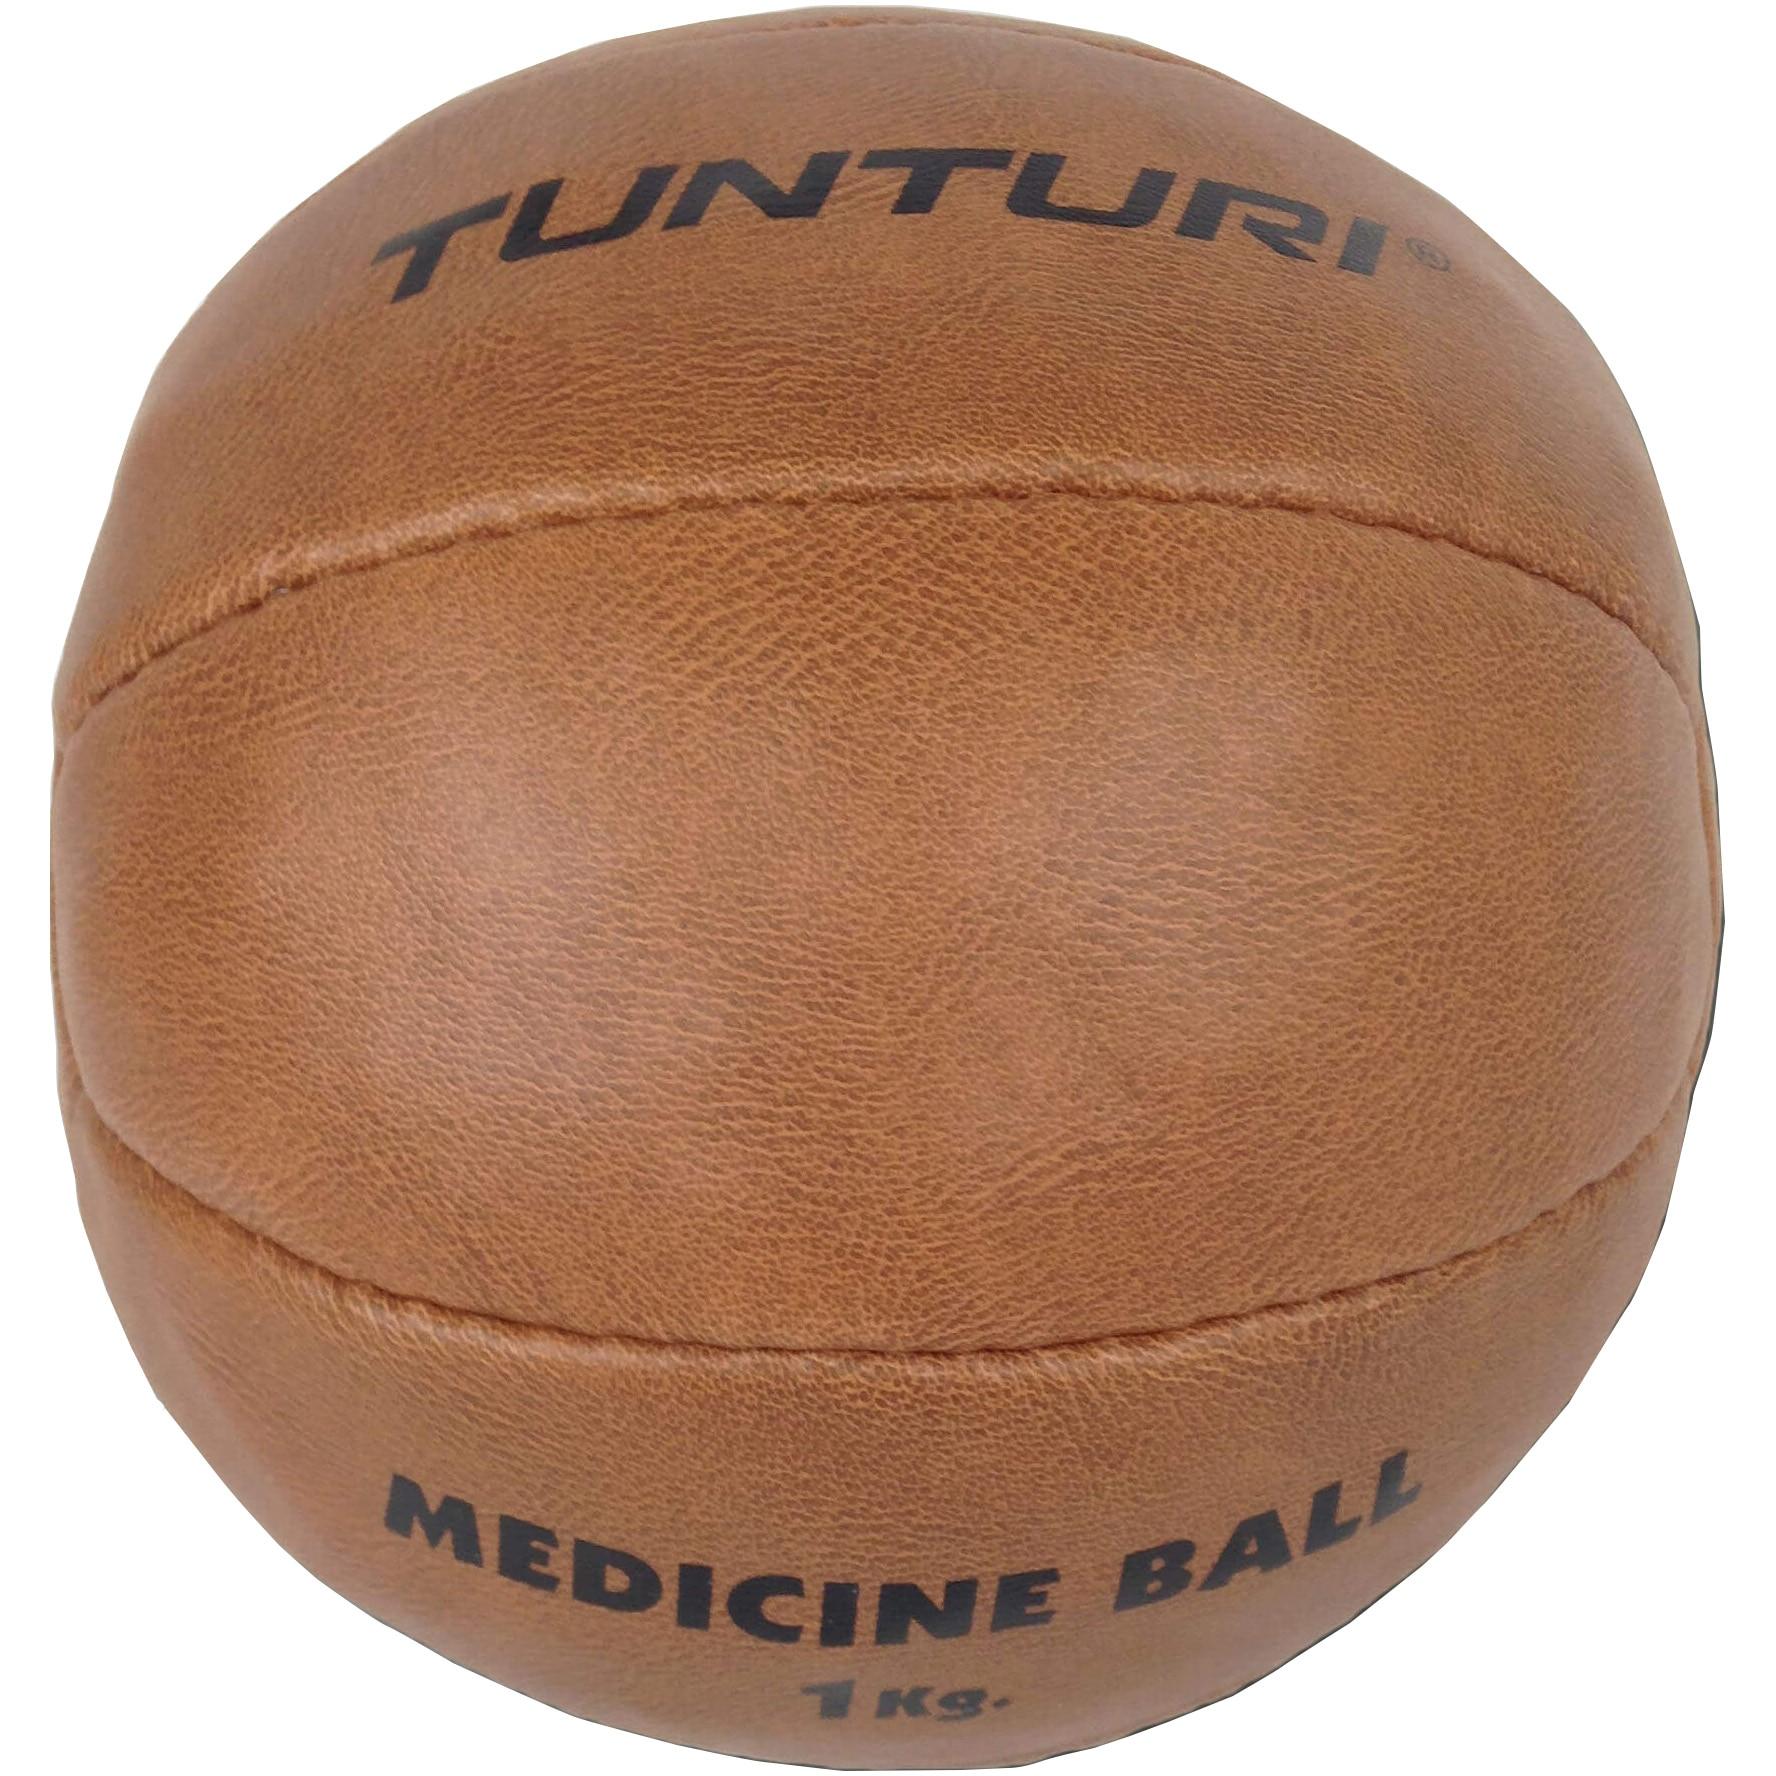 Fotografie Minge mediciala Tunturi, 1kg, piele sintetica